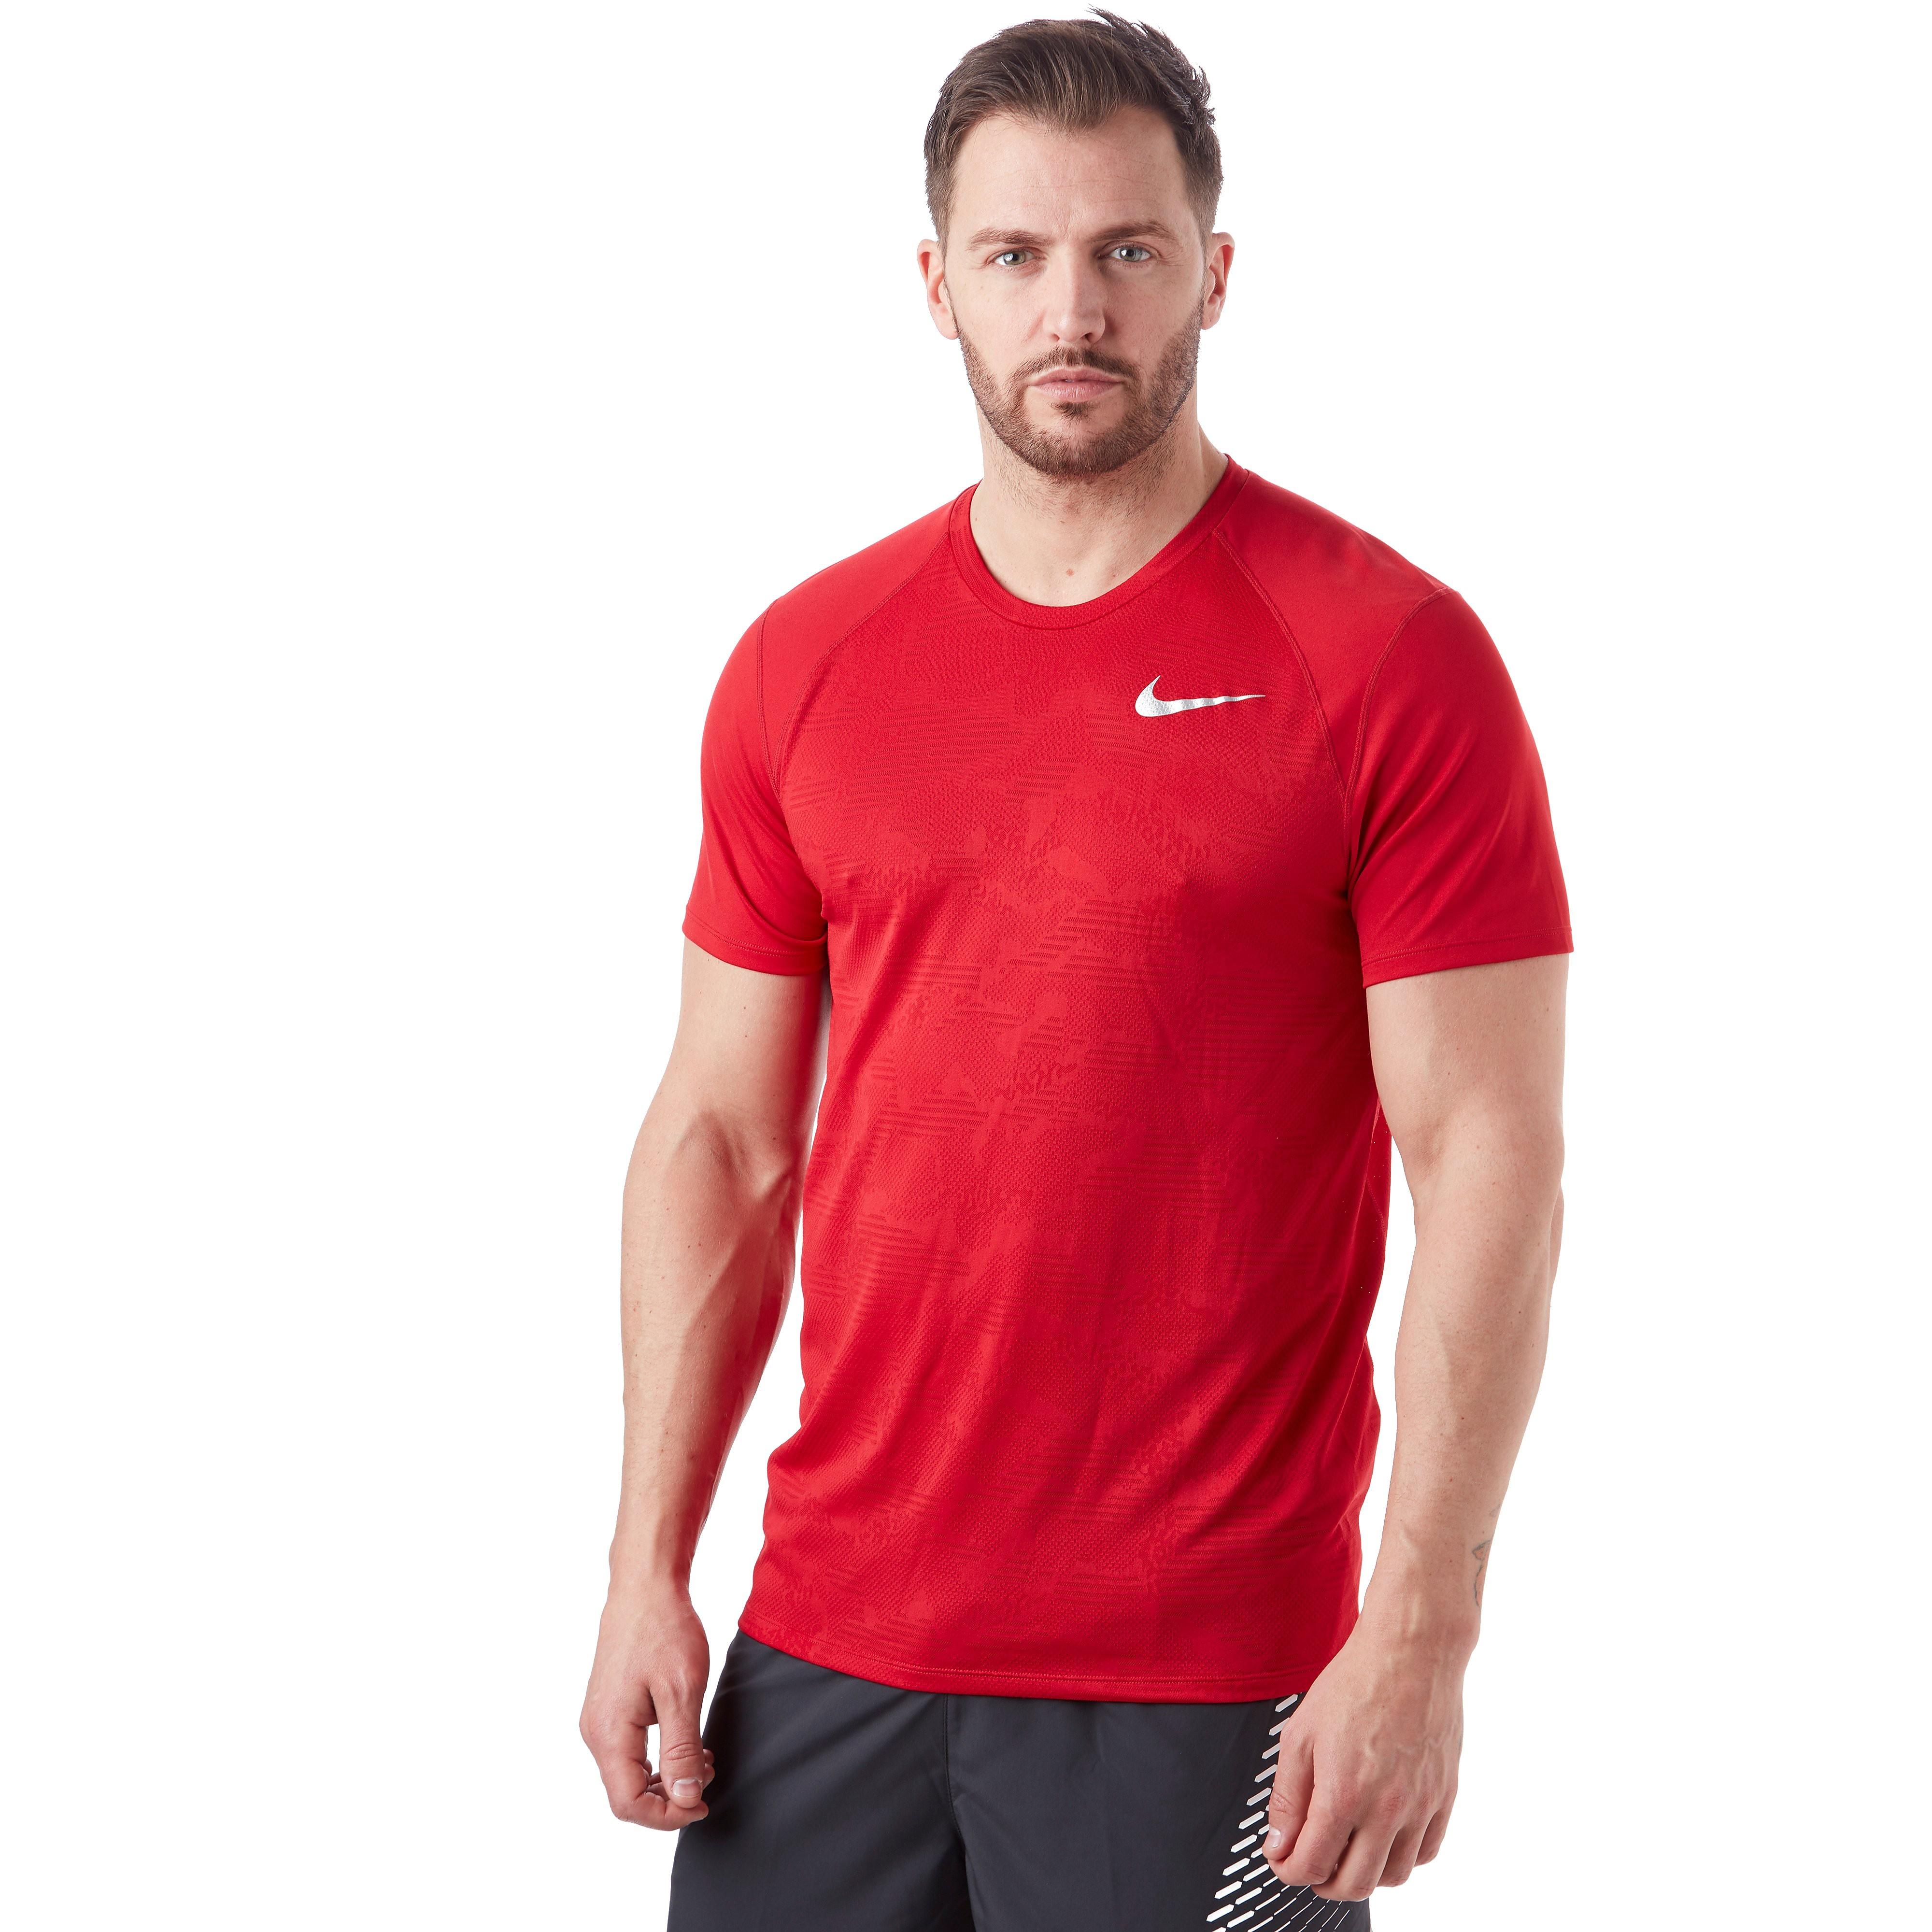 Nike Dri-Fit Miller Cool Men's Training Top